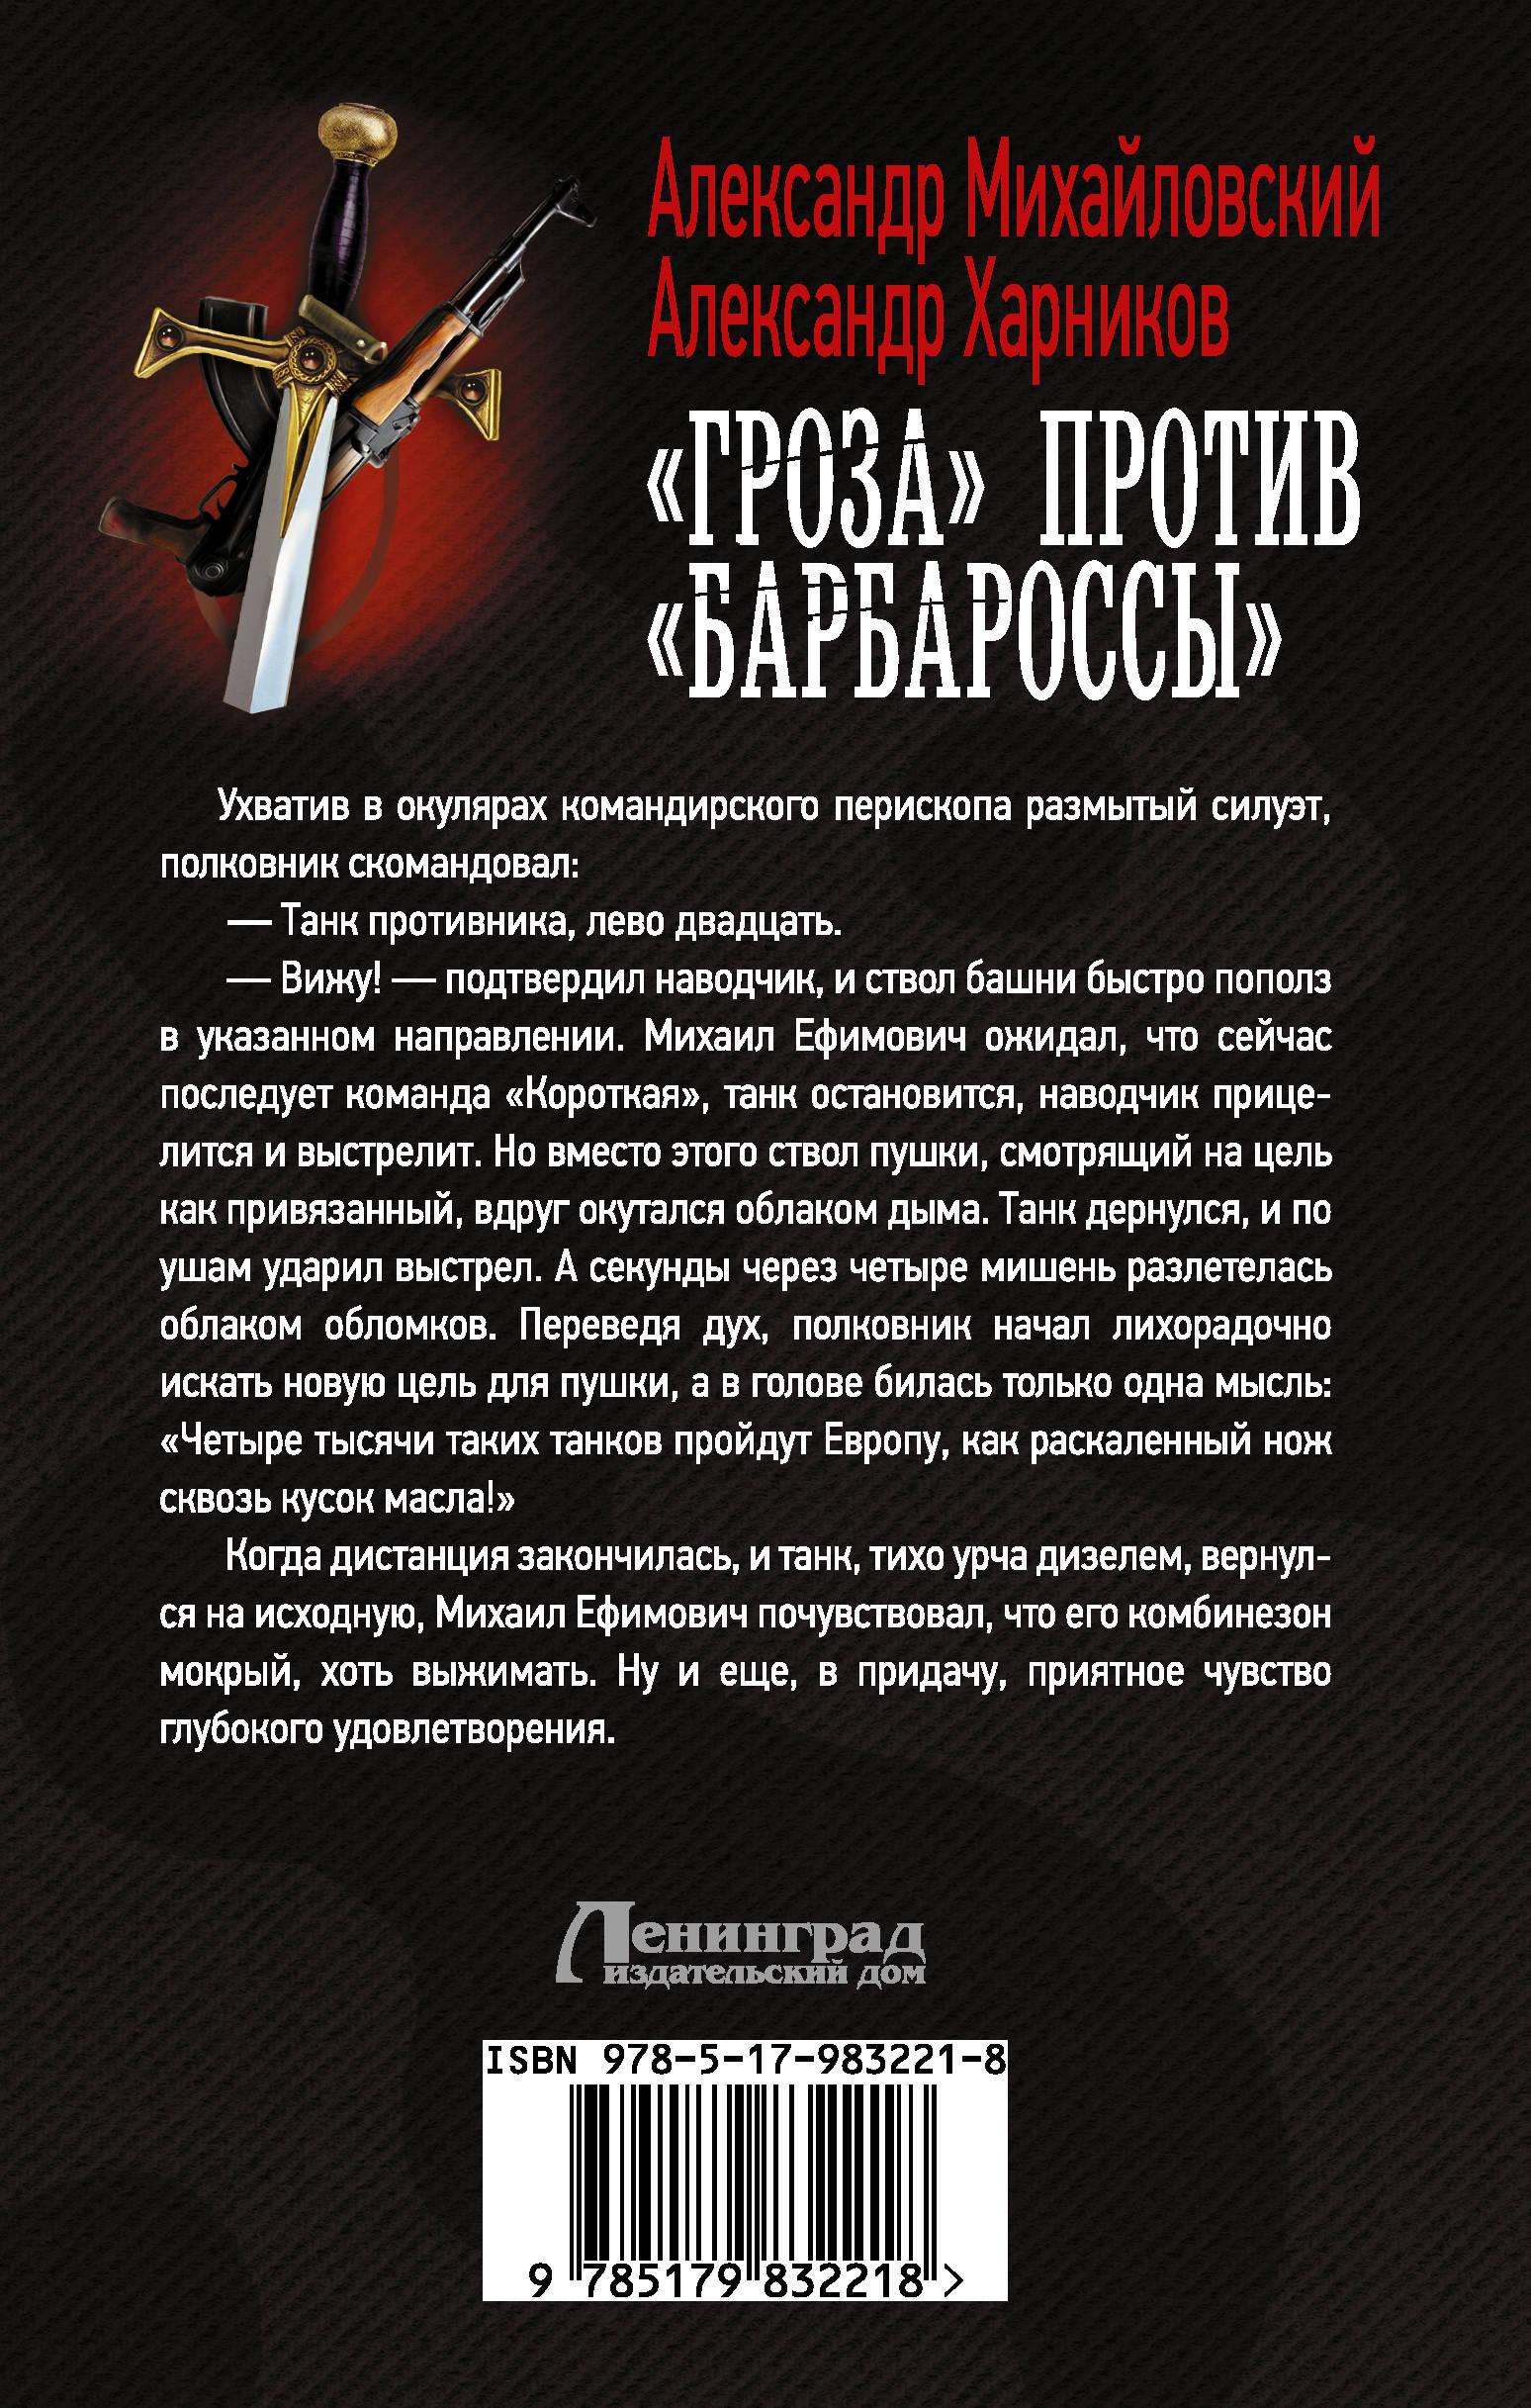 «Гроза» против «Барбароссы». Михайловский Александр Борисович; Харников Александр Петрович